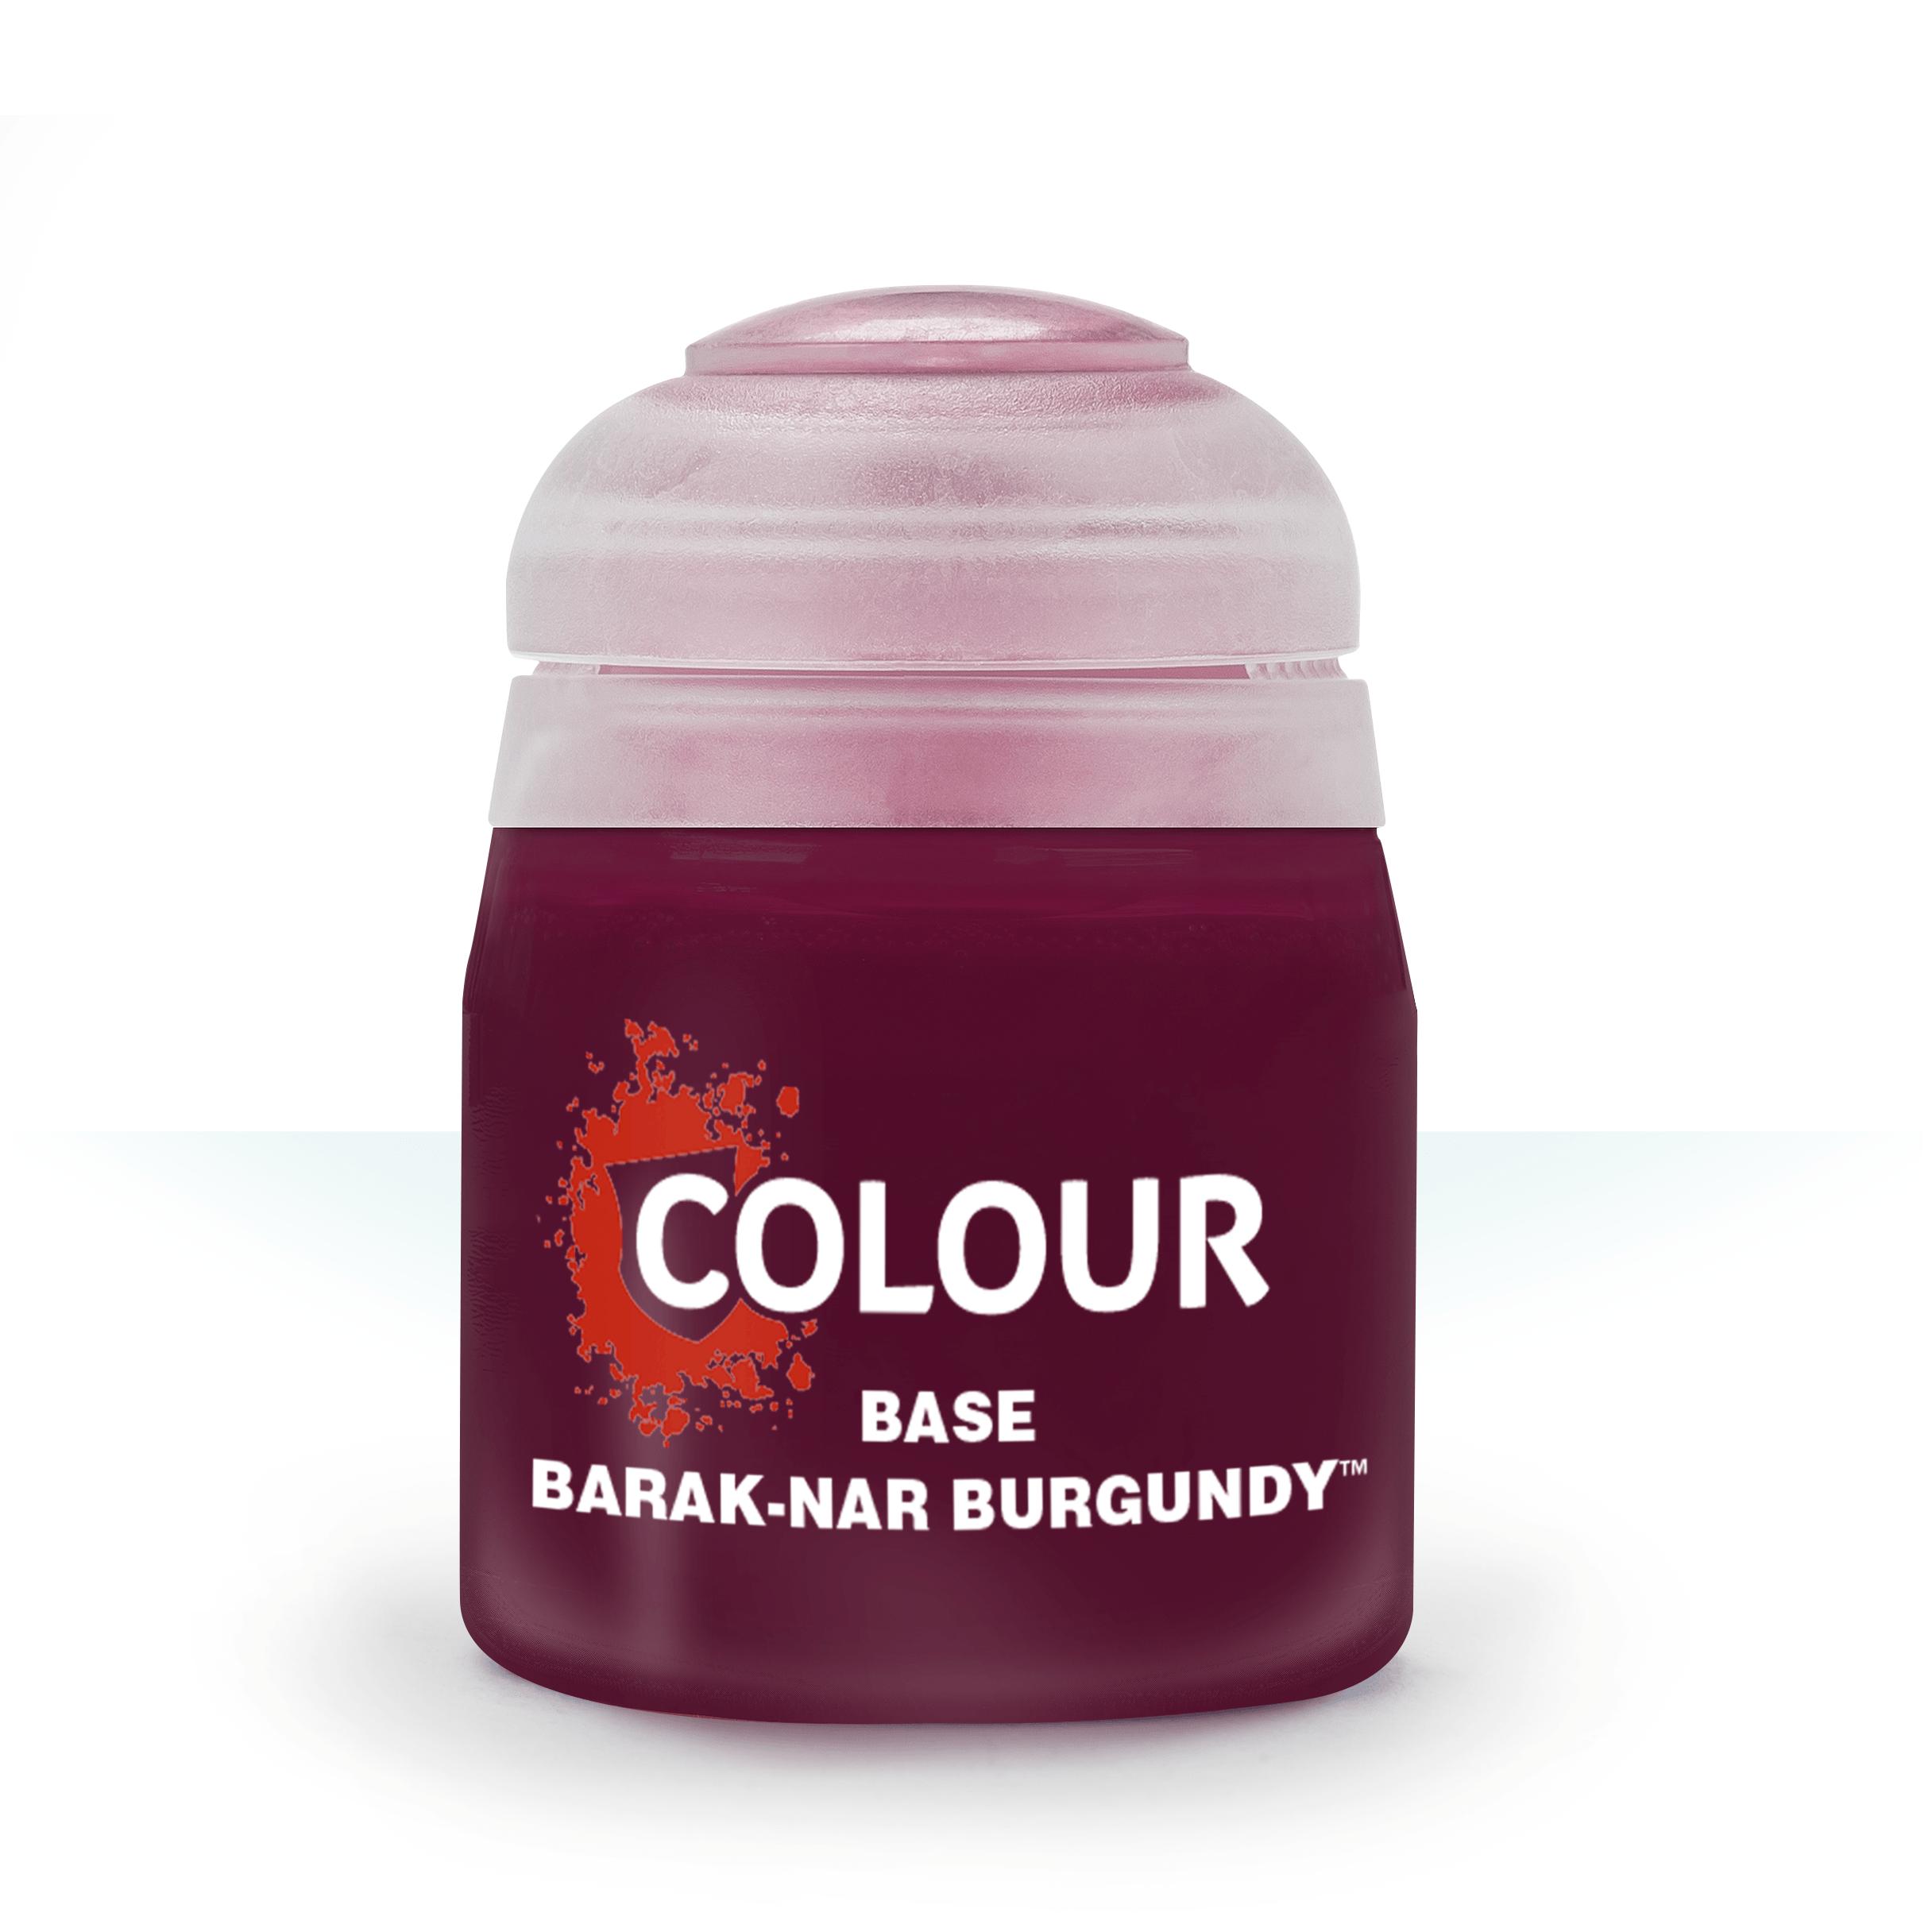 Base Barak Nar Burgundy